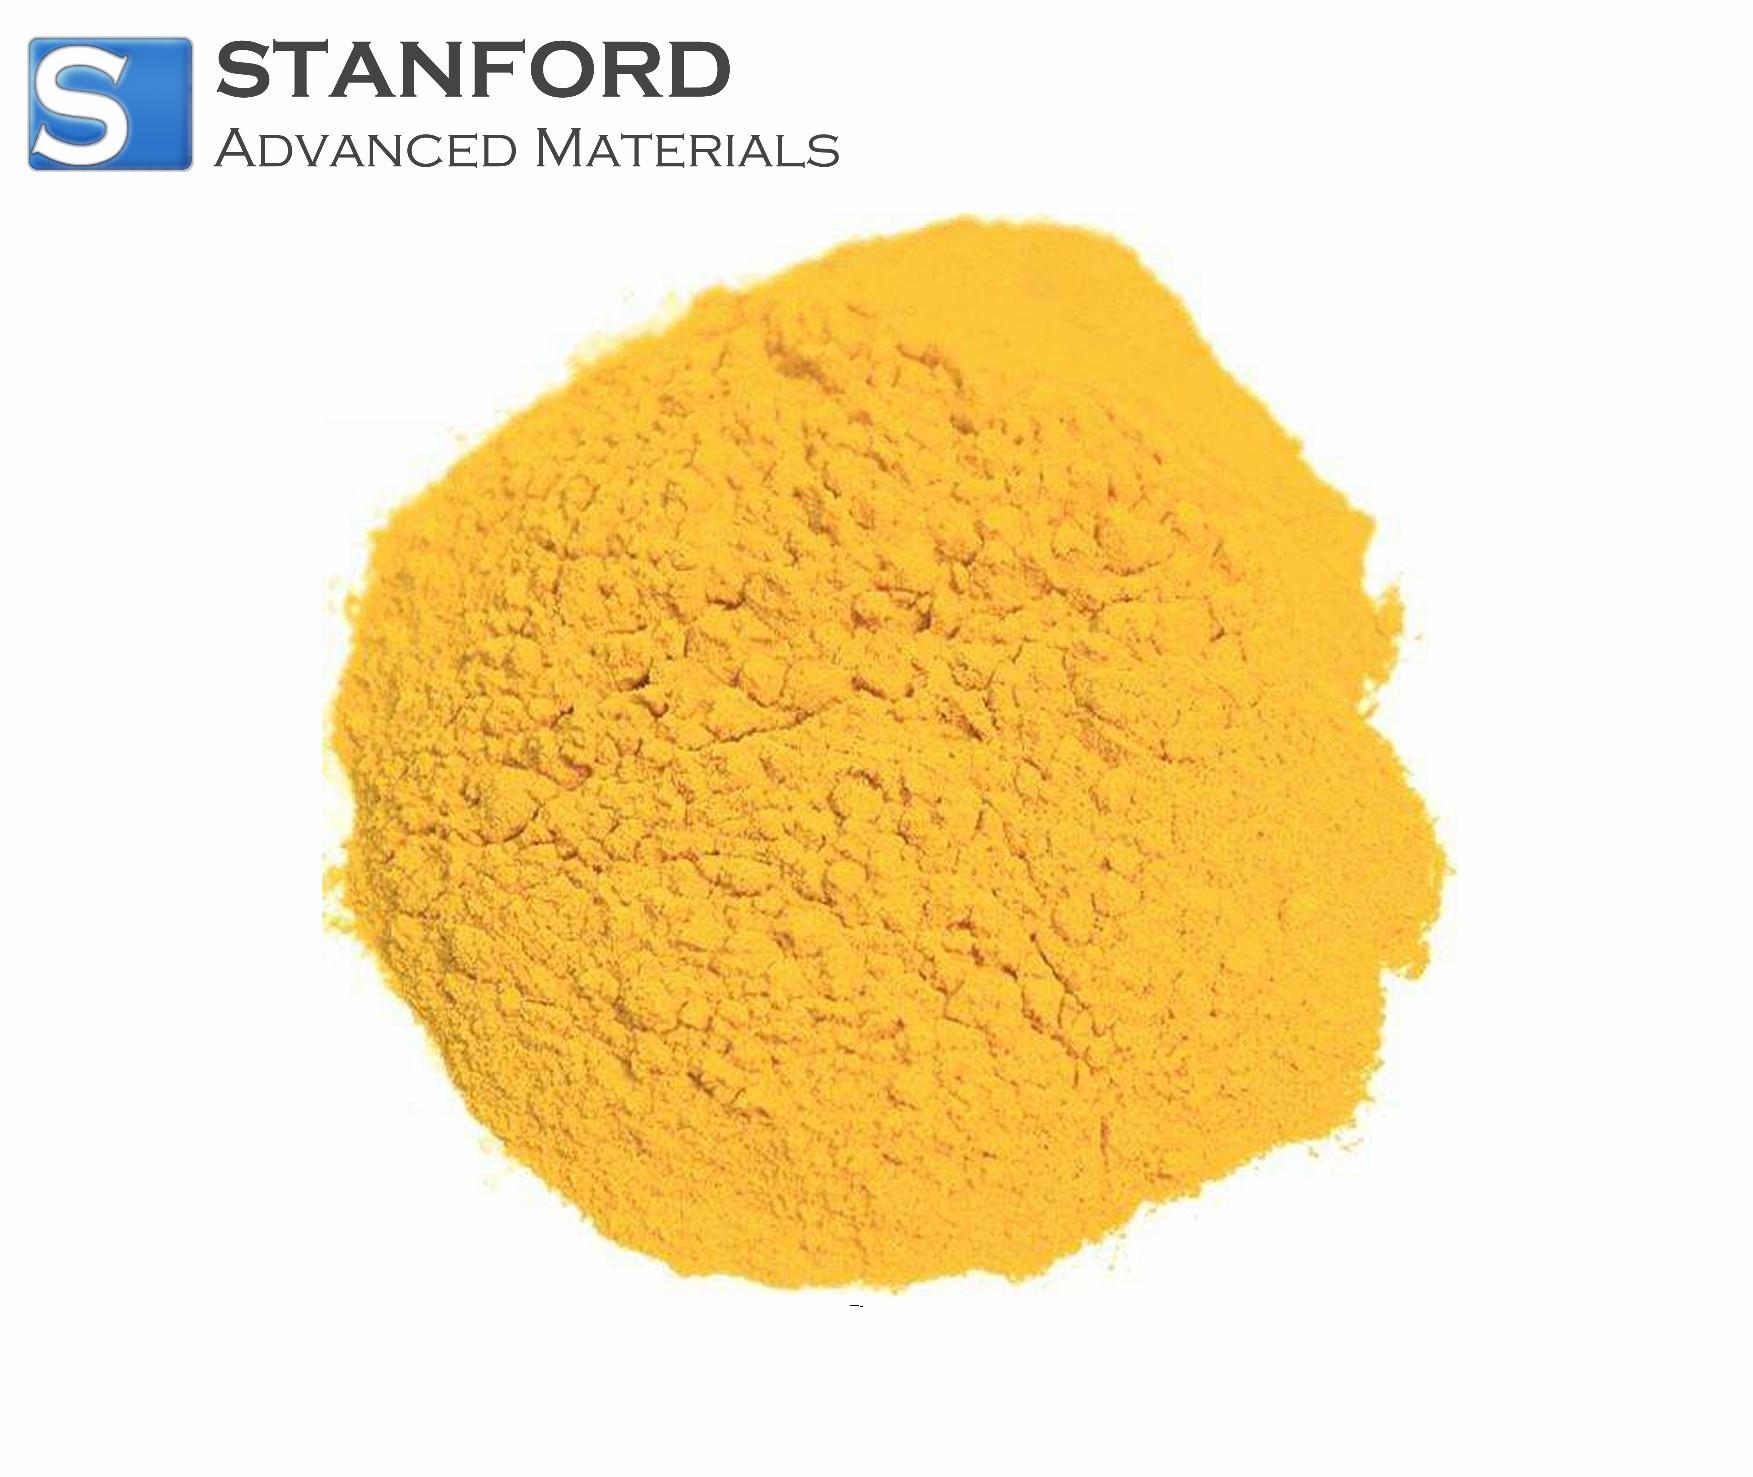 OM2222 Ir(ppy)3 Powder